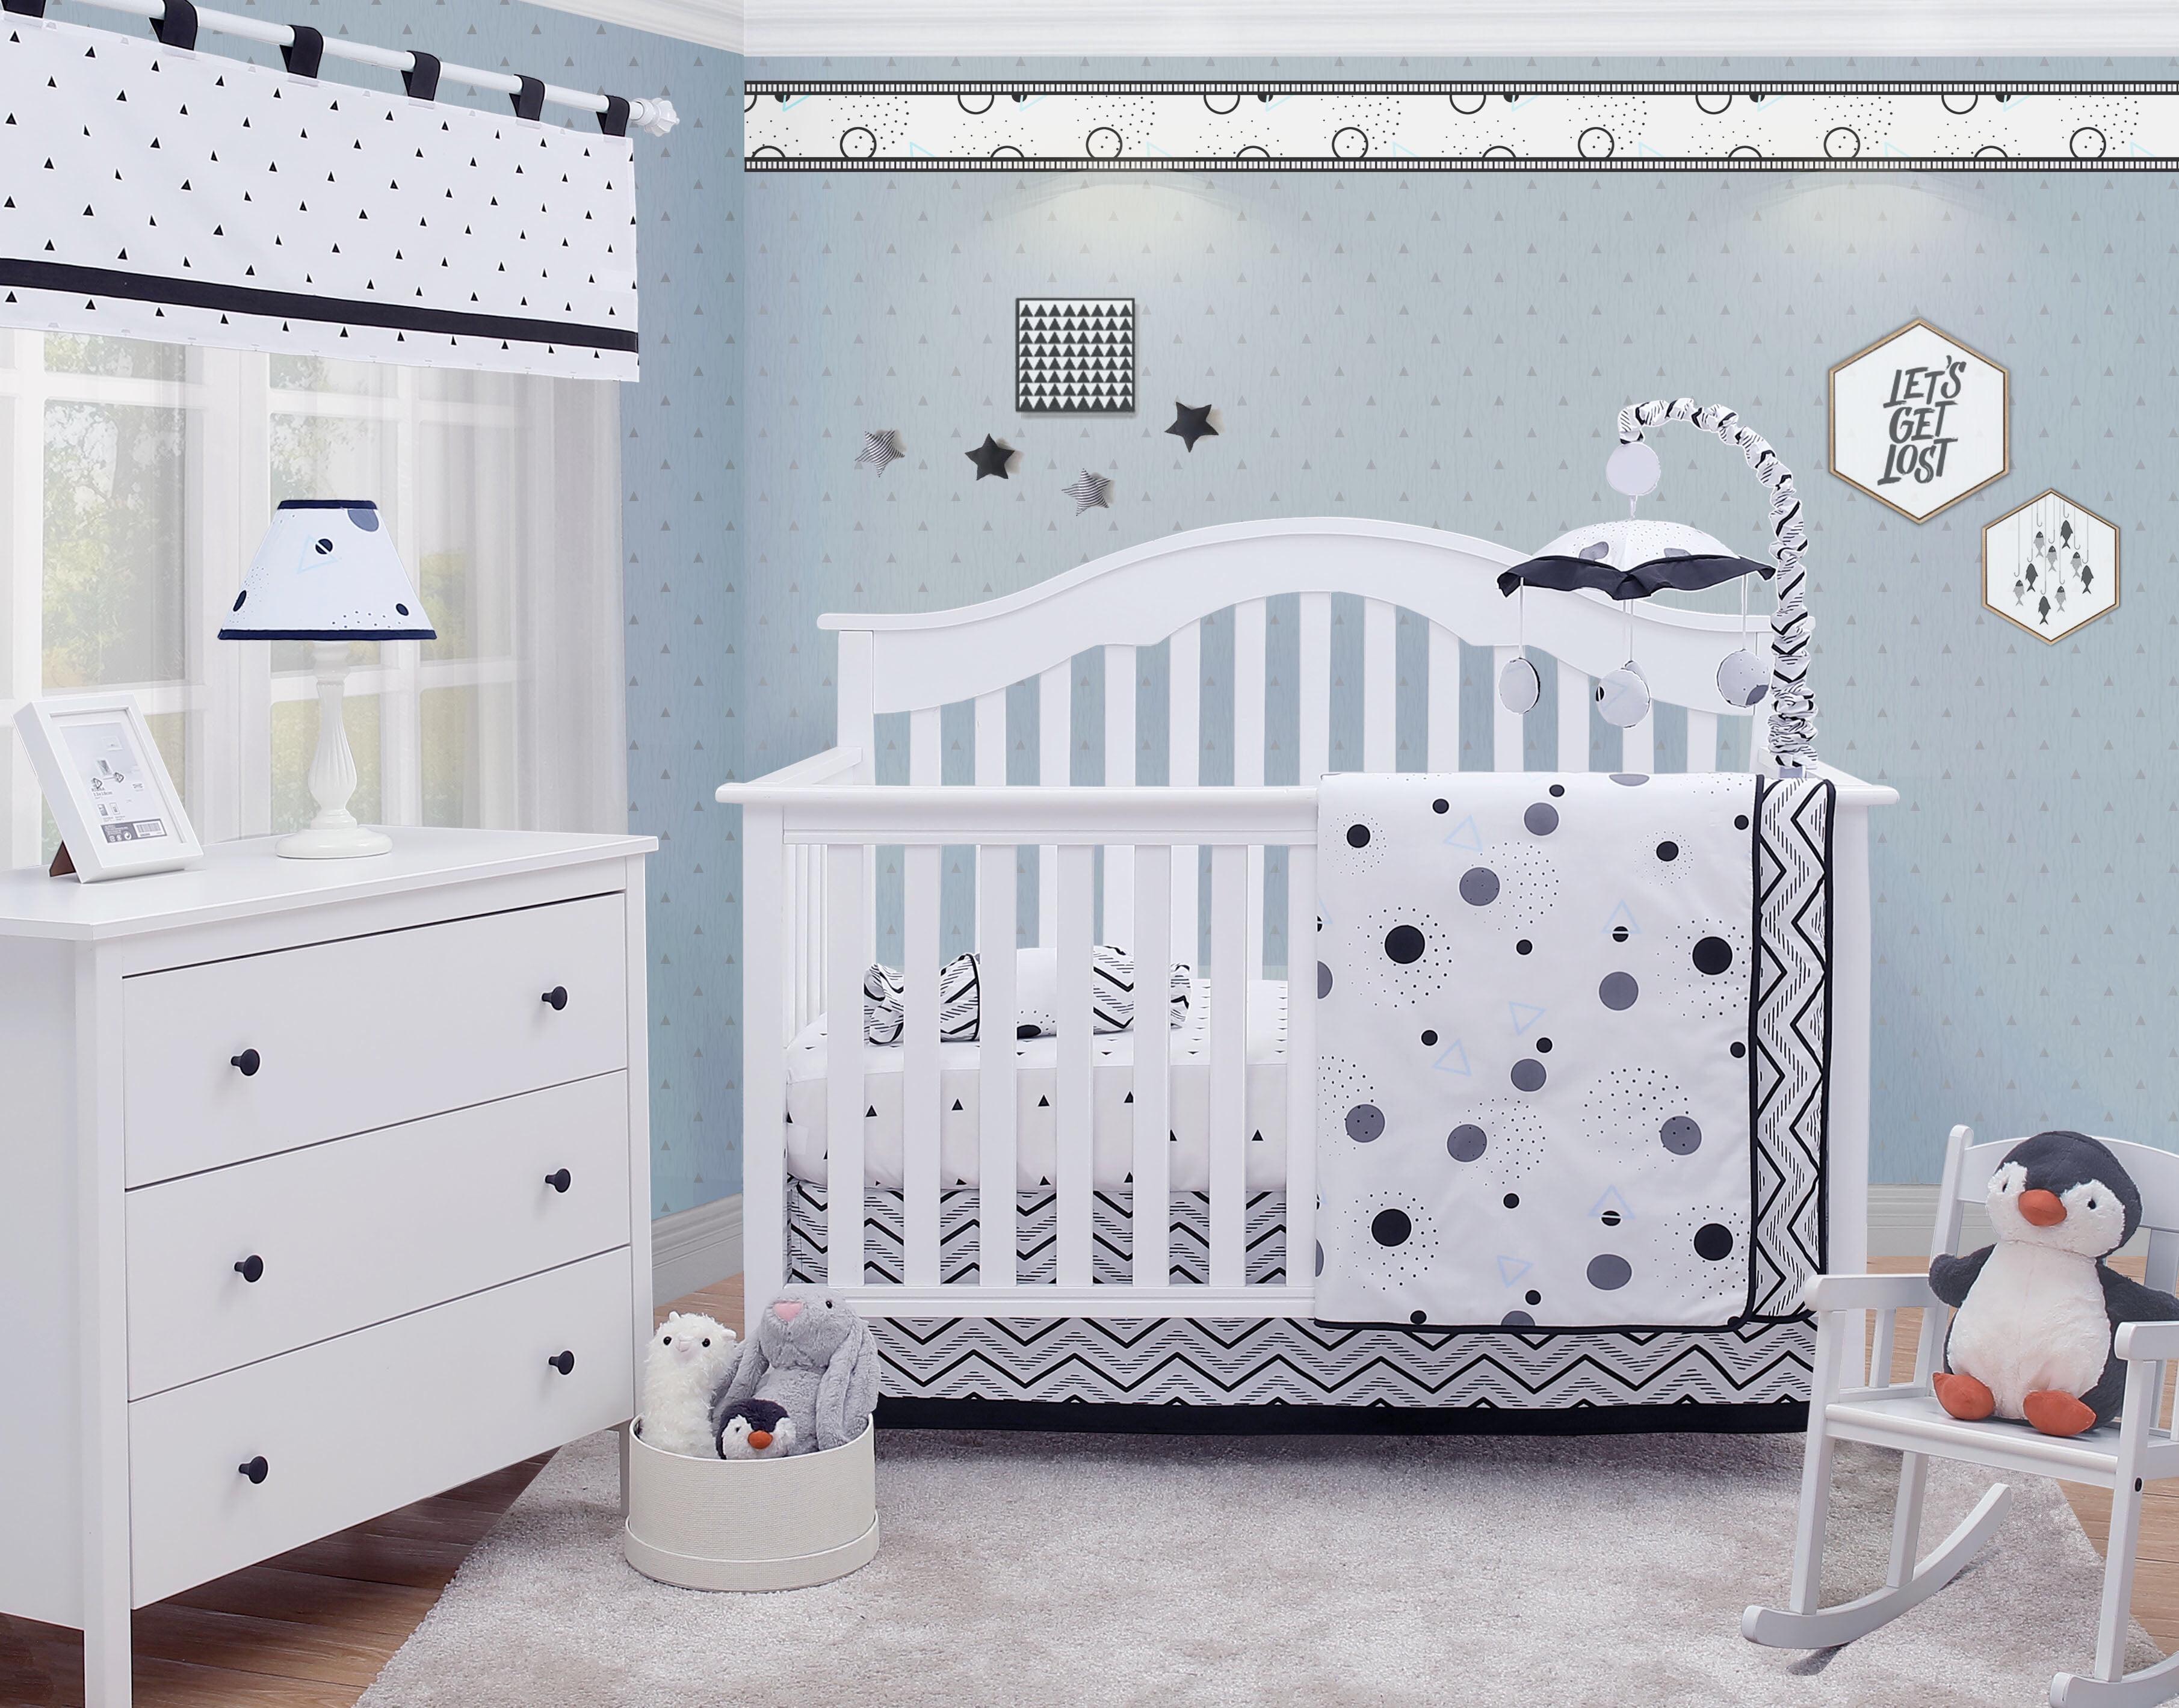 Optimababy Black White Polka Dot Pattern 6 Piece Baby Nursery Crib Bedding Set Walmart Com Walmart Com